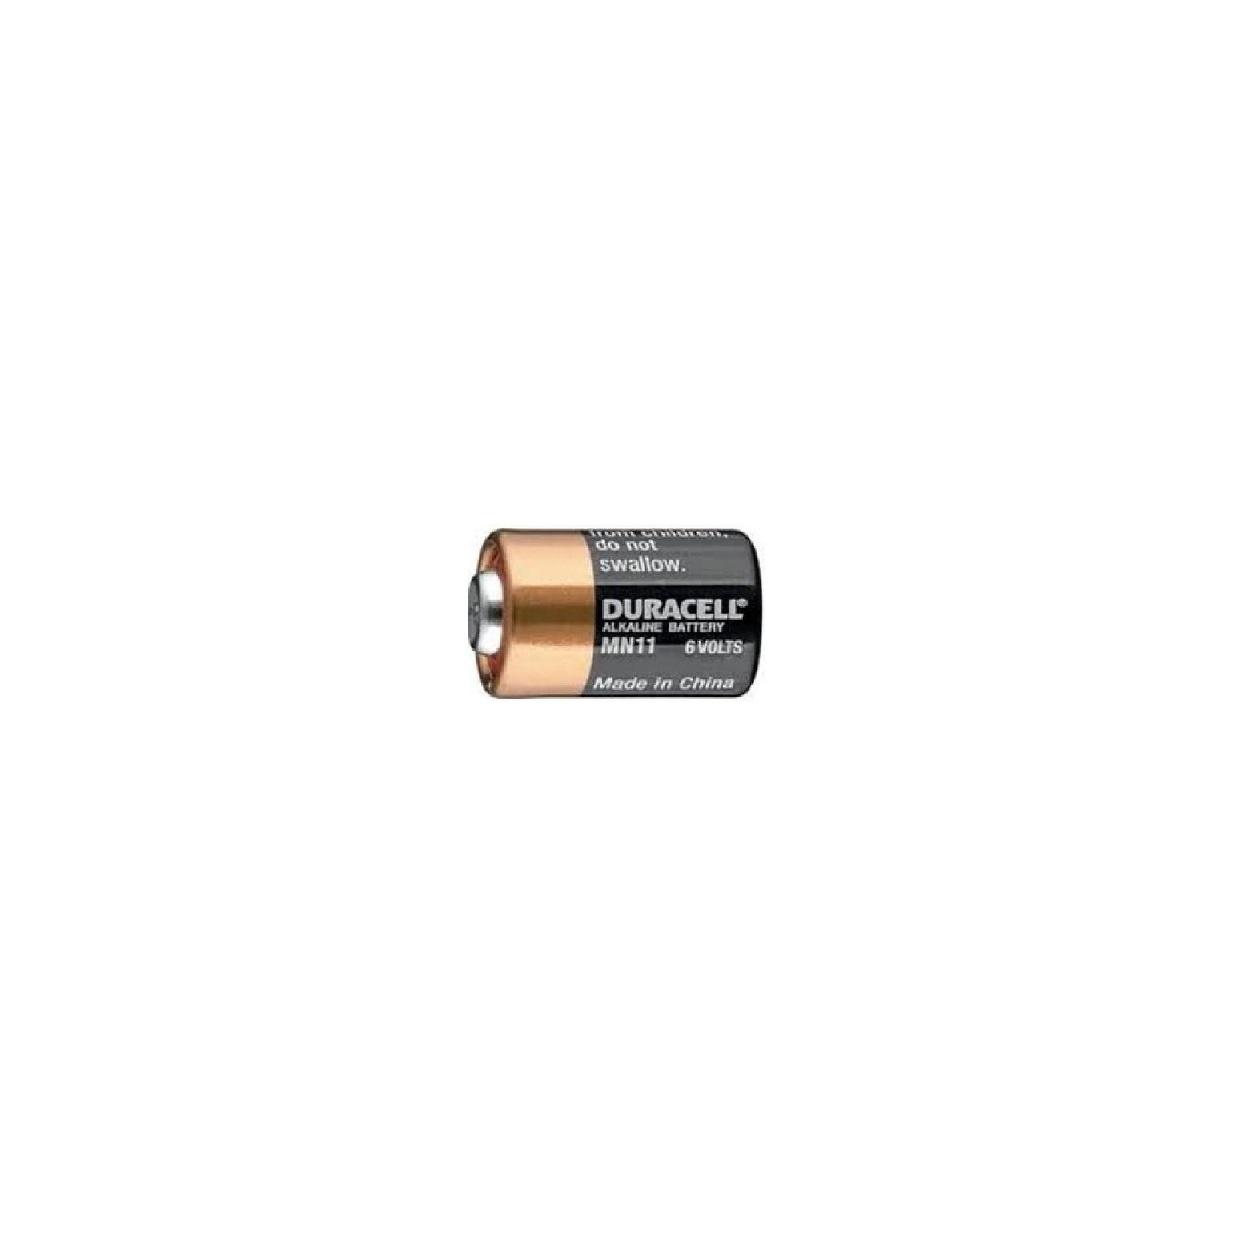 Duracell 6 Volt MN11 alkaline batterij